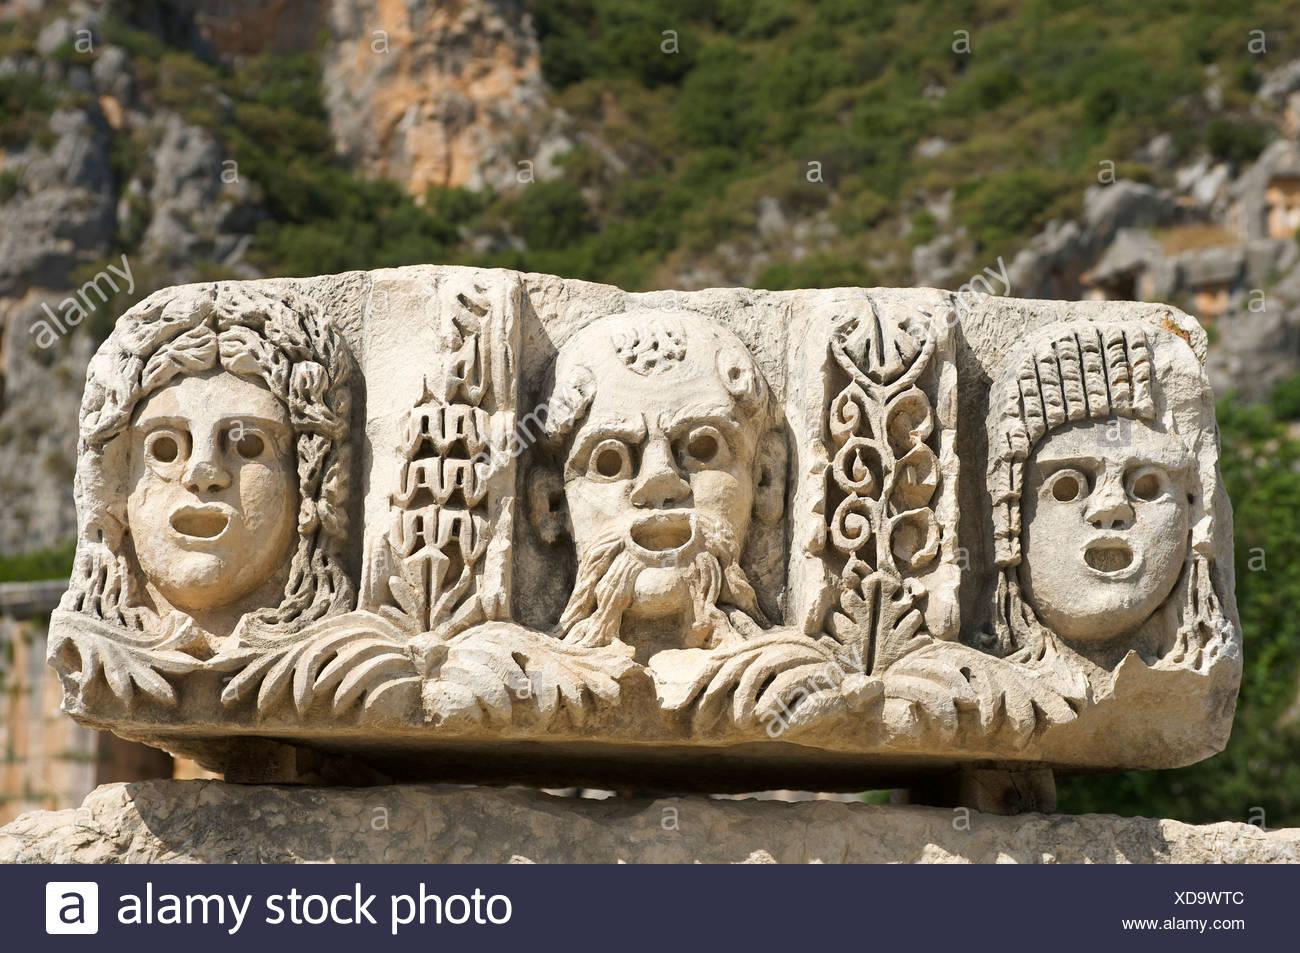 Turkish, Riviera, theatrical masks Myra, Lycia, south coast, Turkey, culture - Stock Image